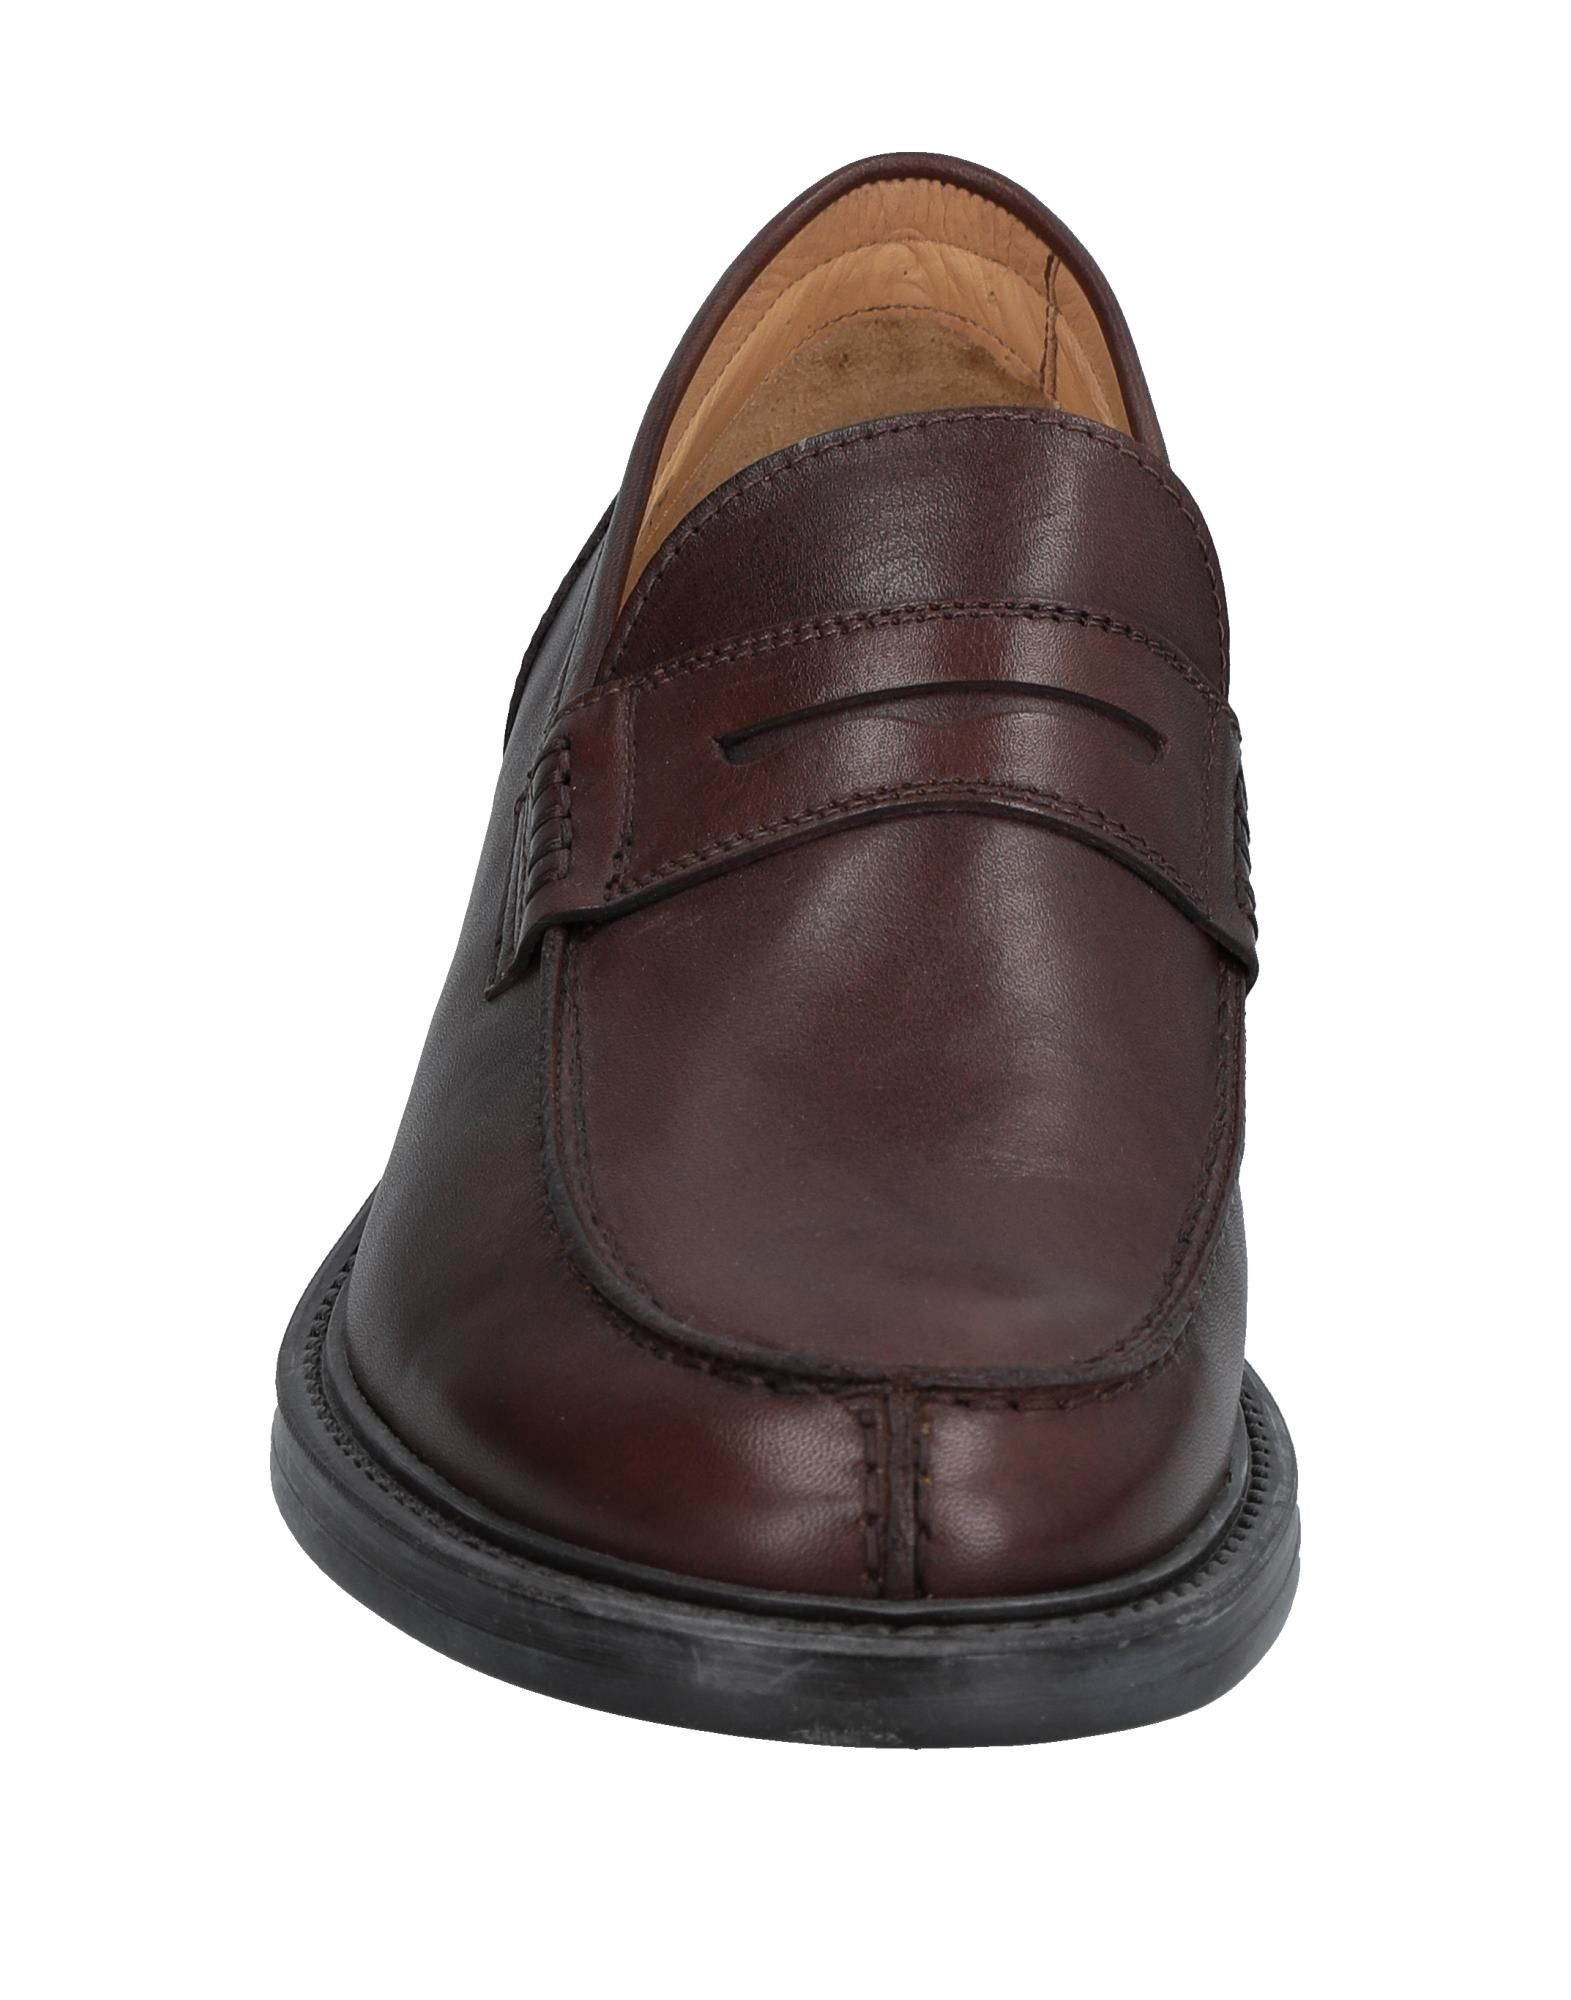 Rabatt echte Mokassins Schuhe Anderson Mokassins echte Herren  11240167WU 01c0f9